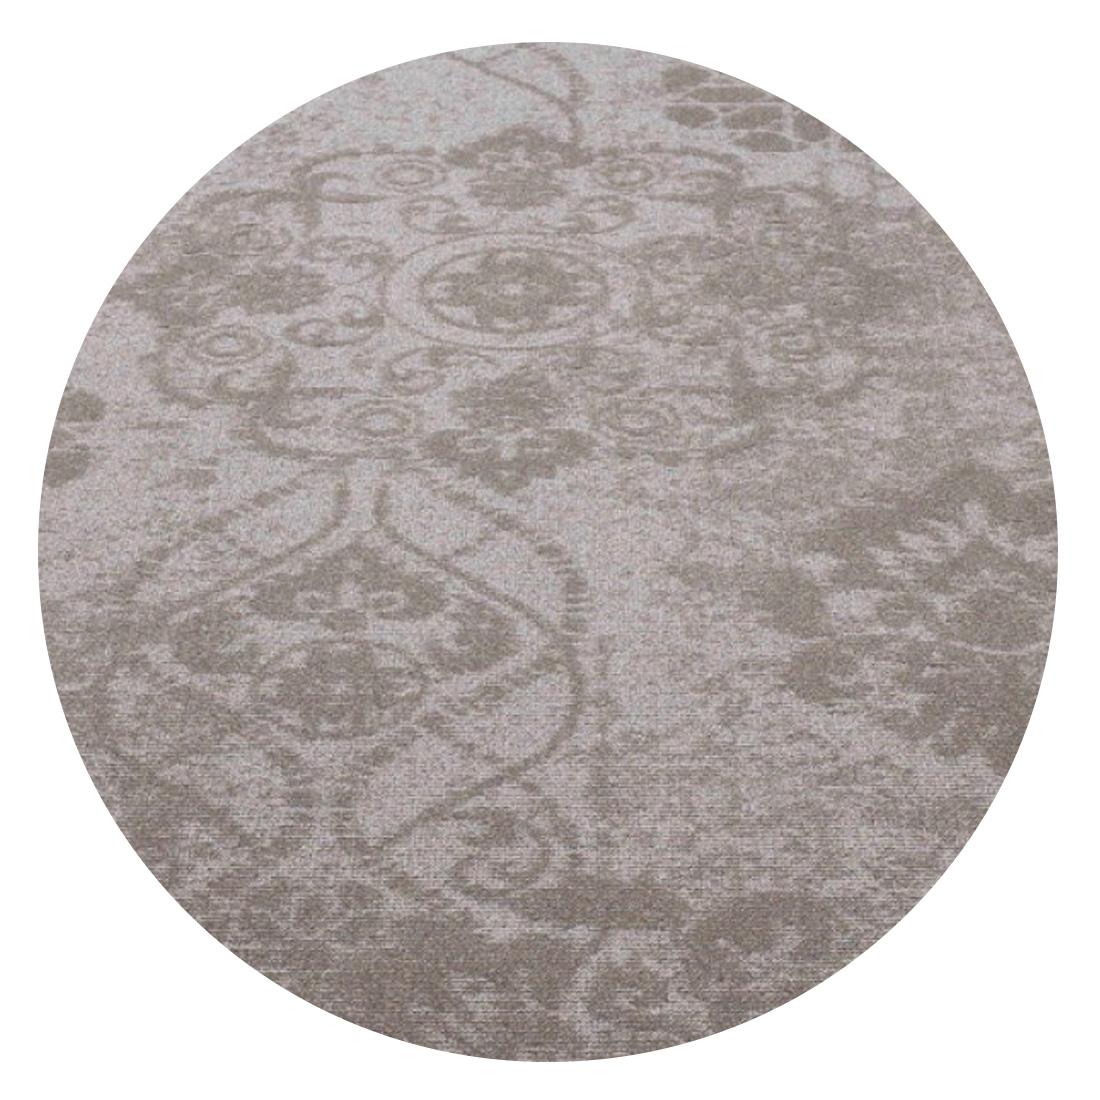 Rond Vintage Vloerkleed Desso Patterns AA17-9526